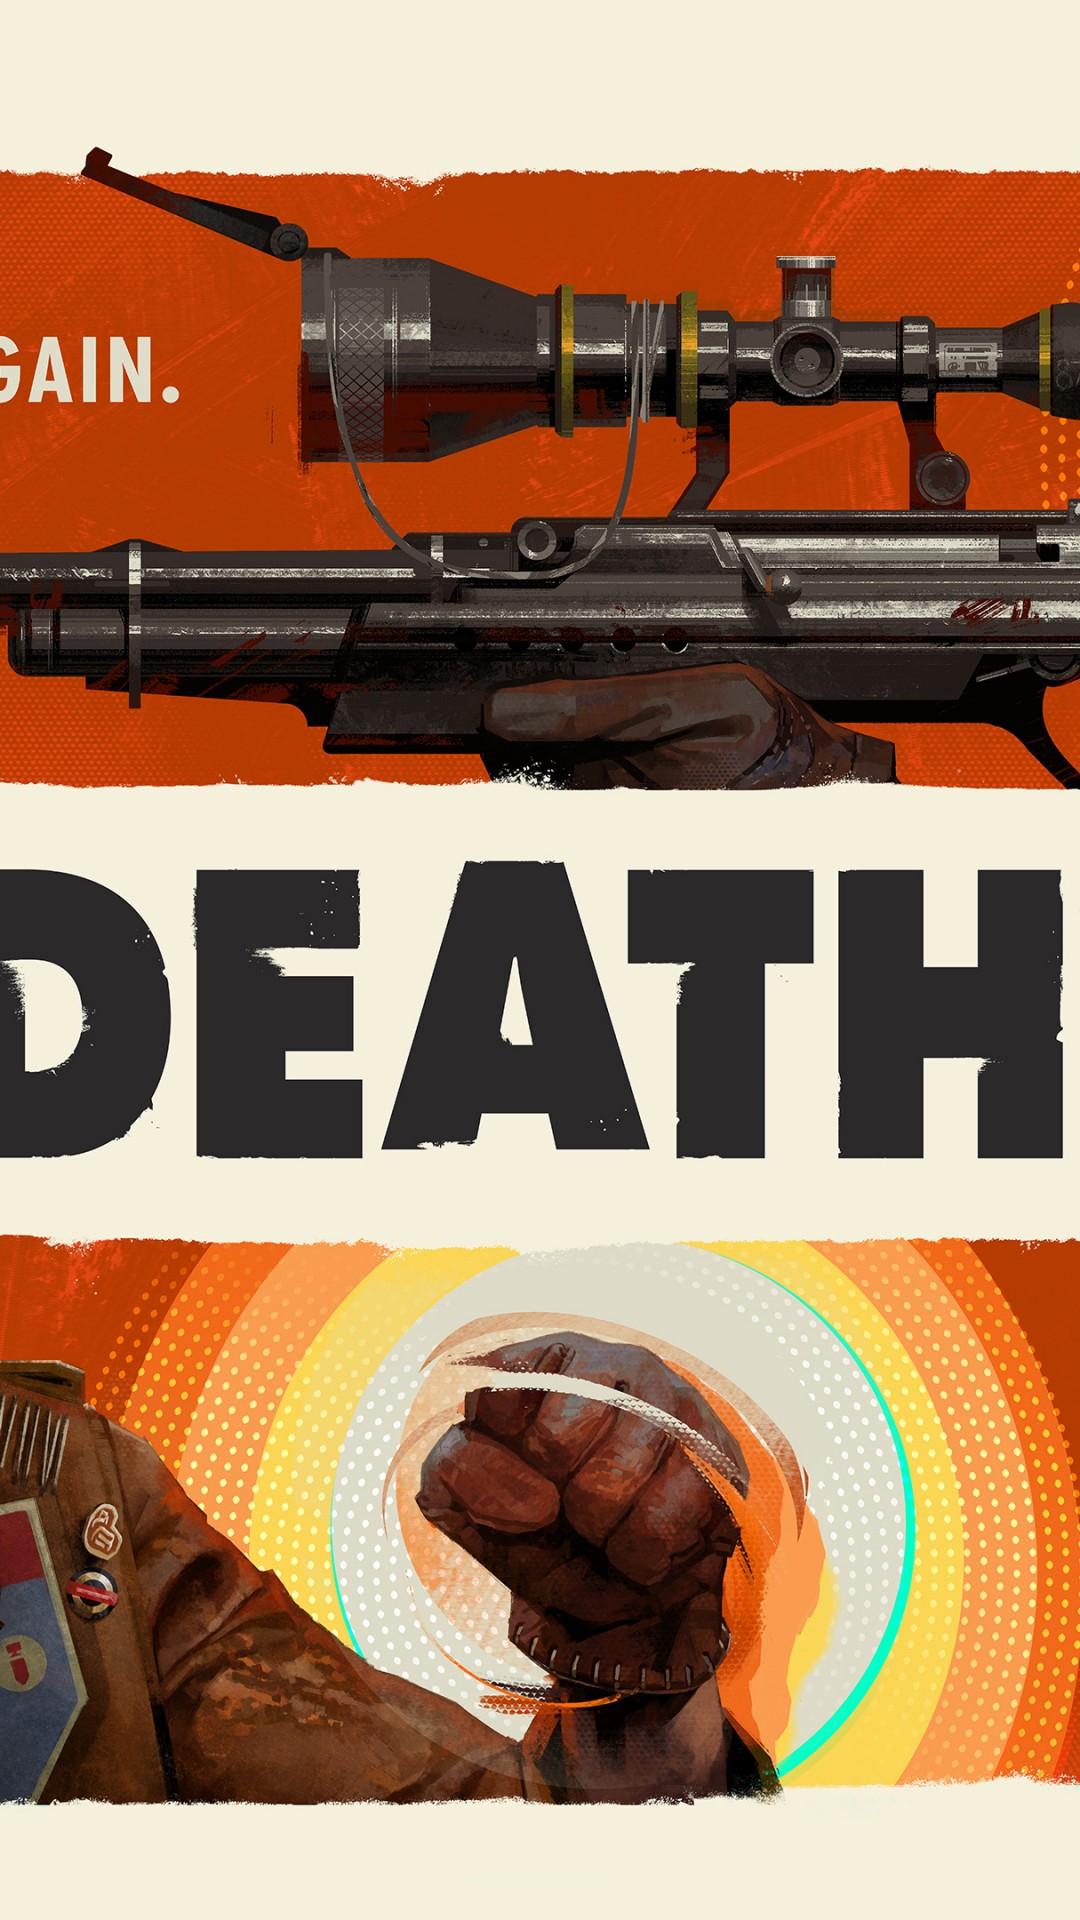 Wallpaper Deathloop, PS5, PlayStation 5, Games #22595